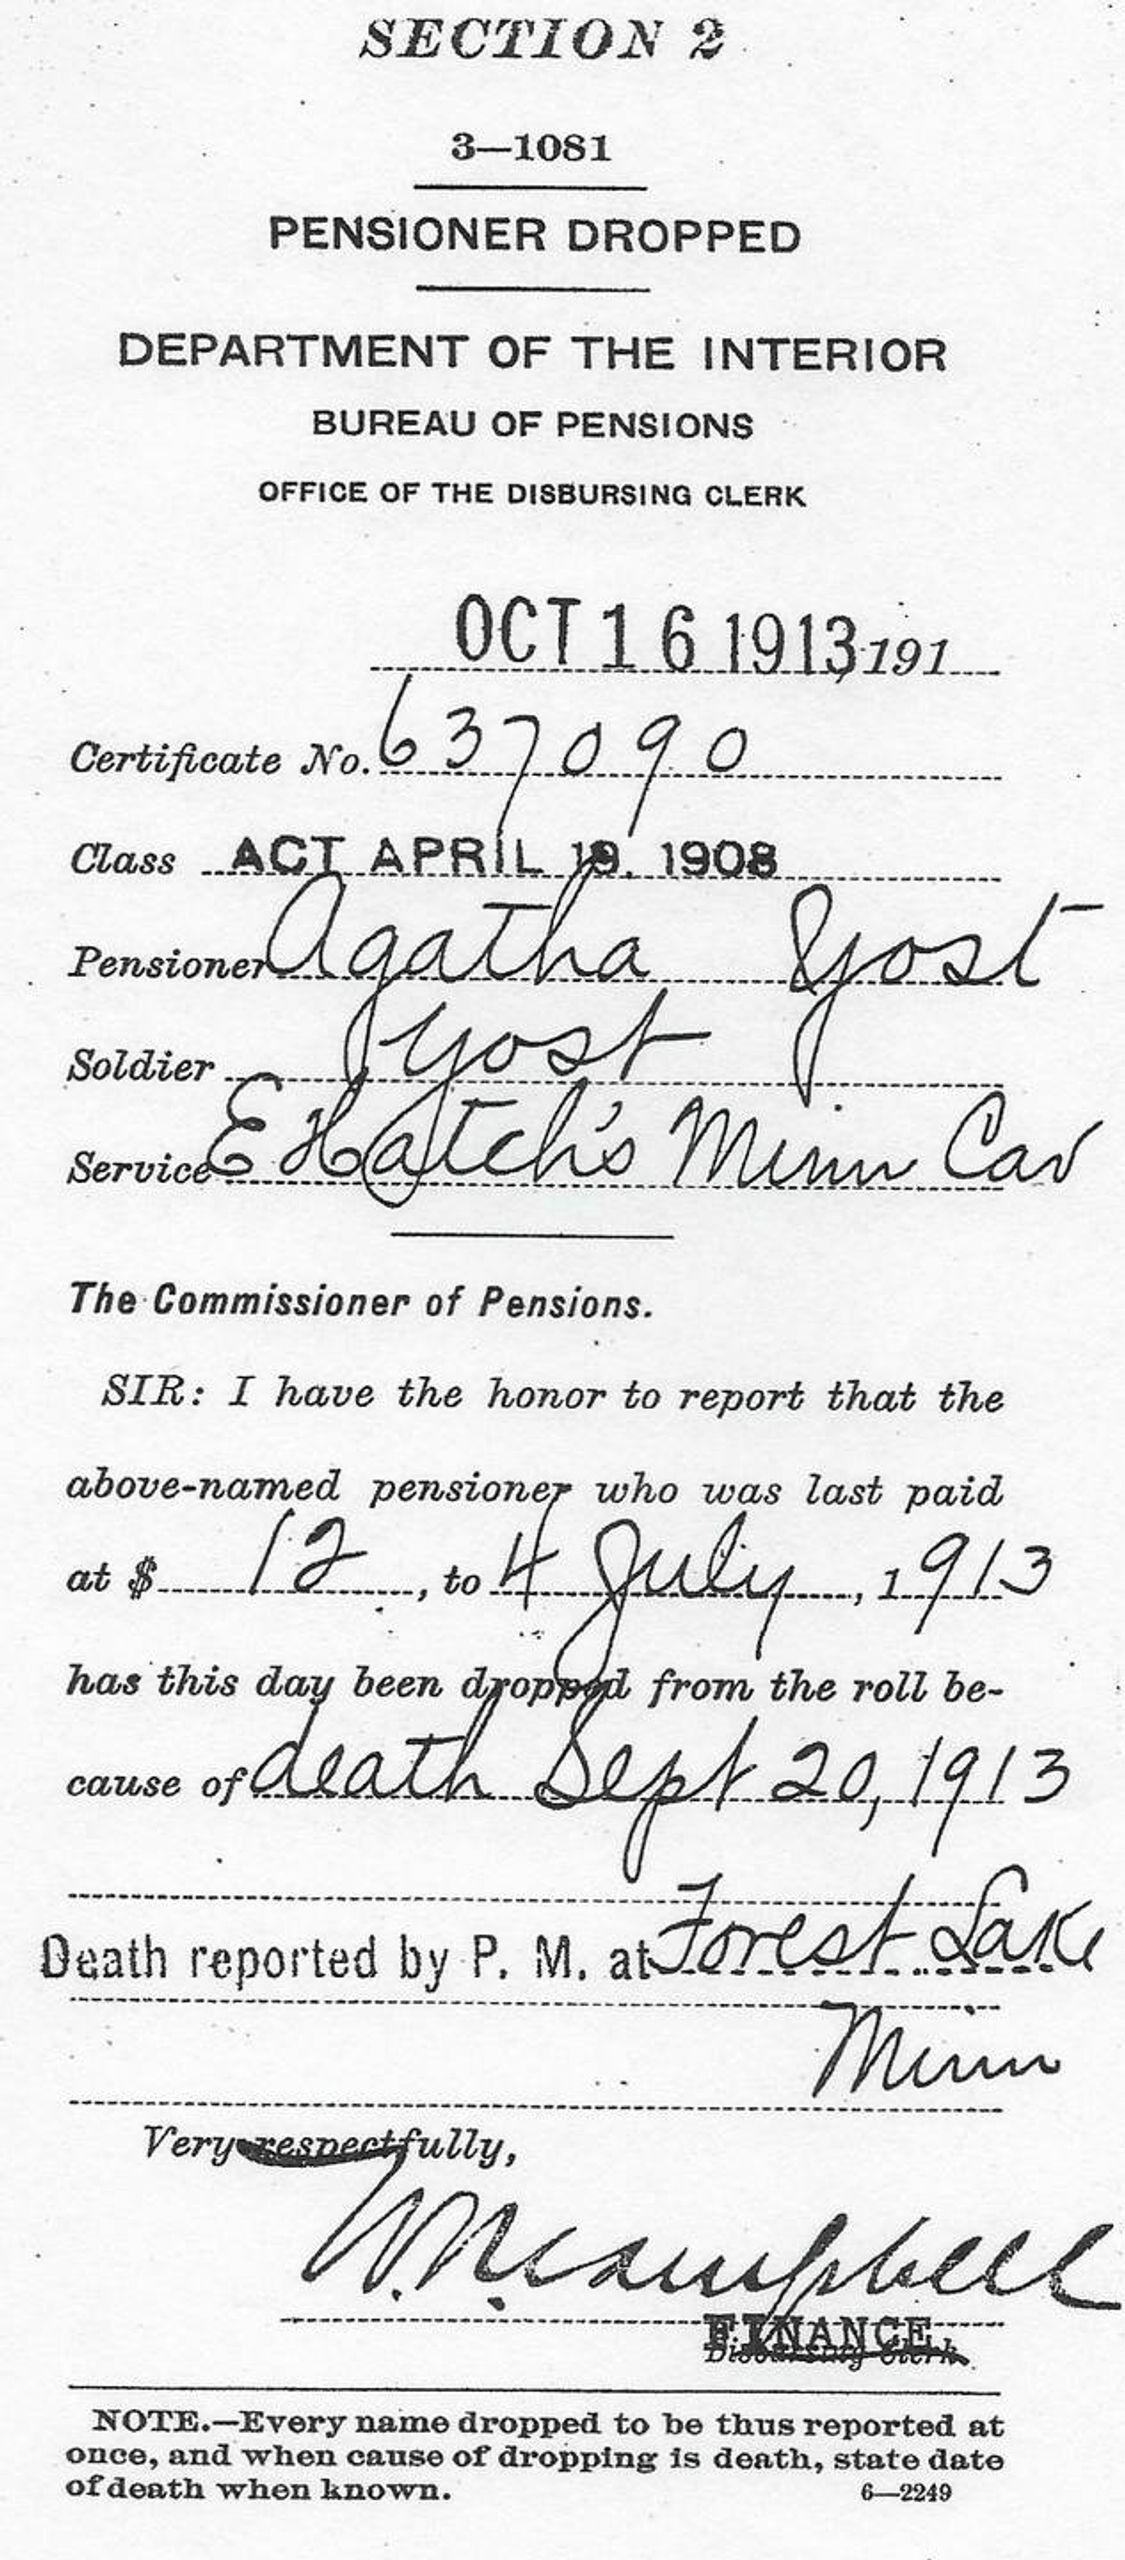 Paperwork describing loss of Agatha's pension